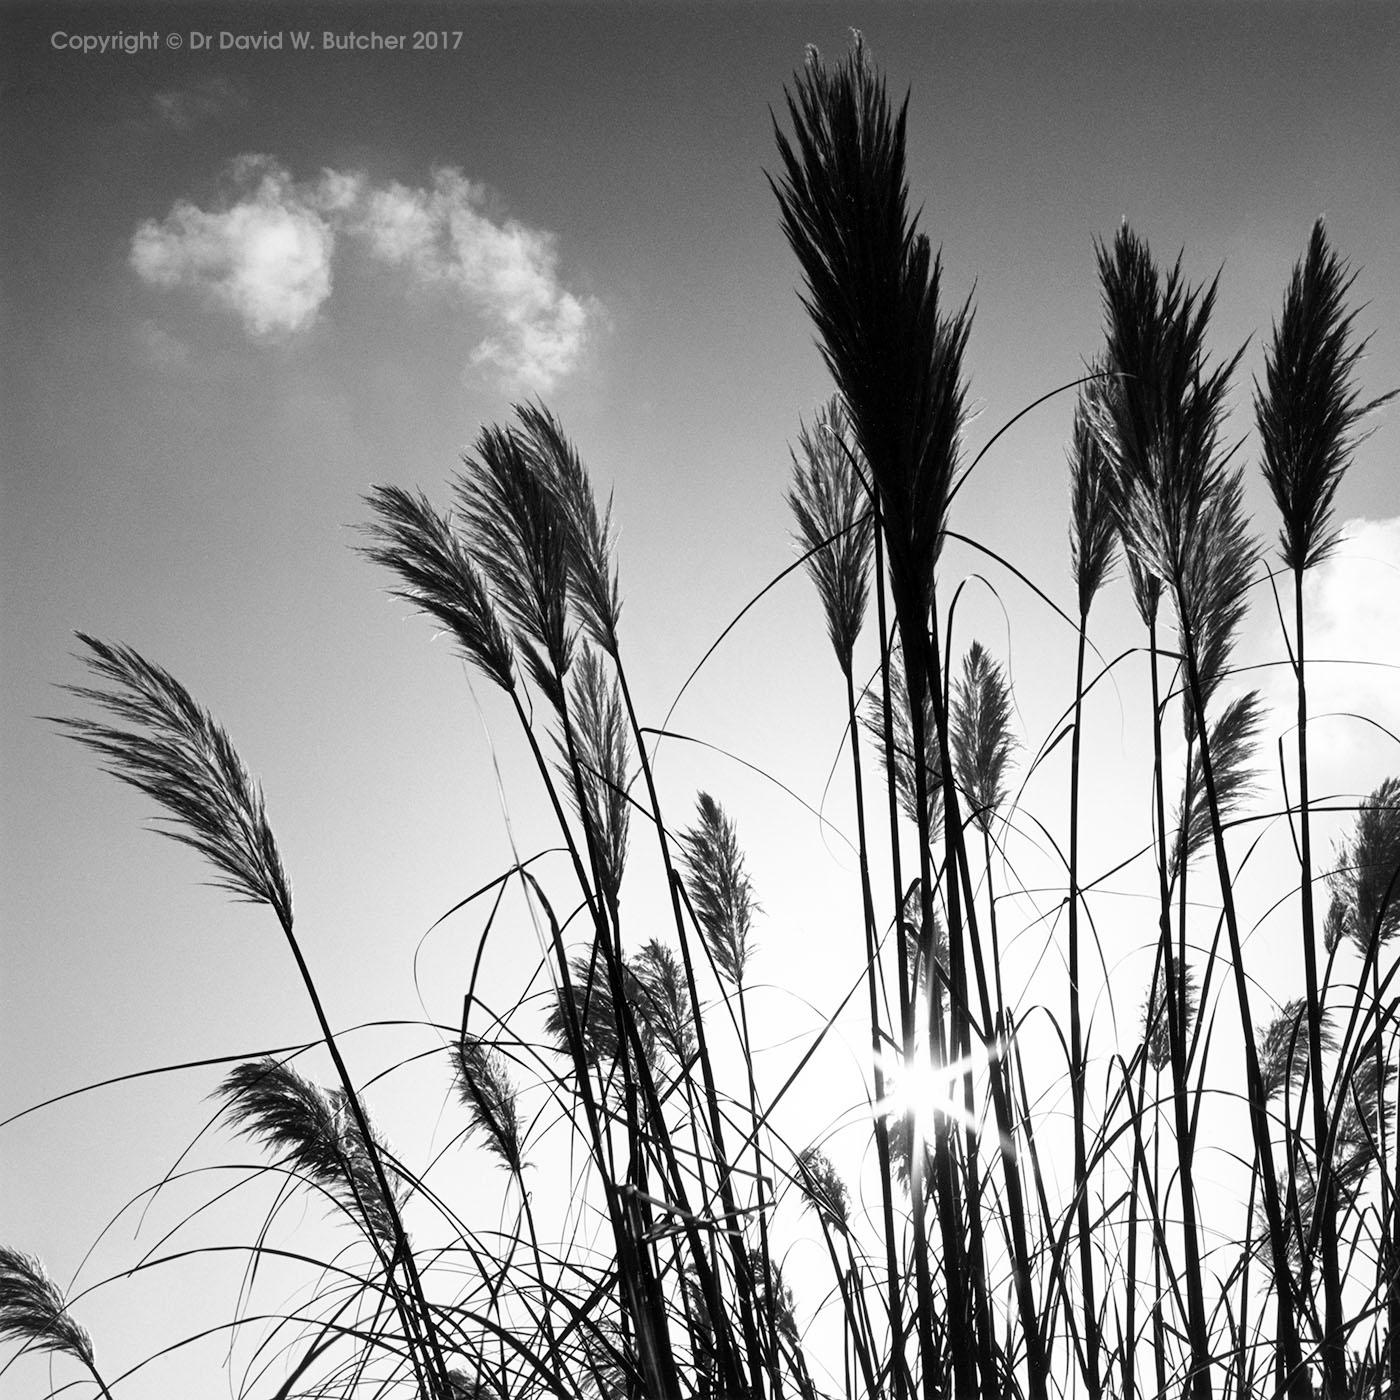 Pampas Grass, Tunstead Milton, Peak District